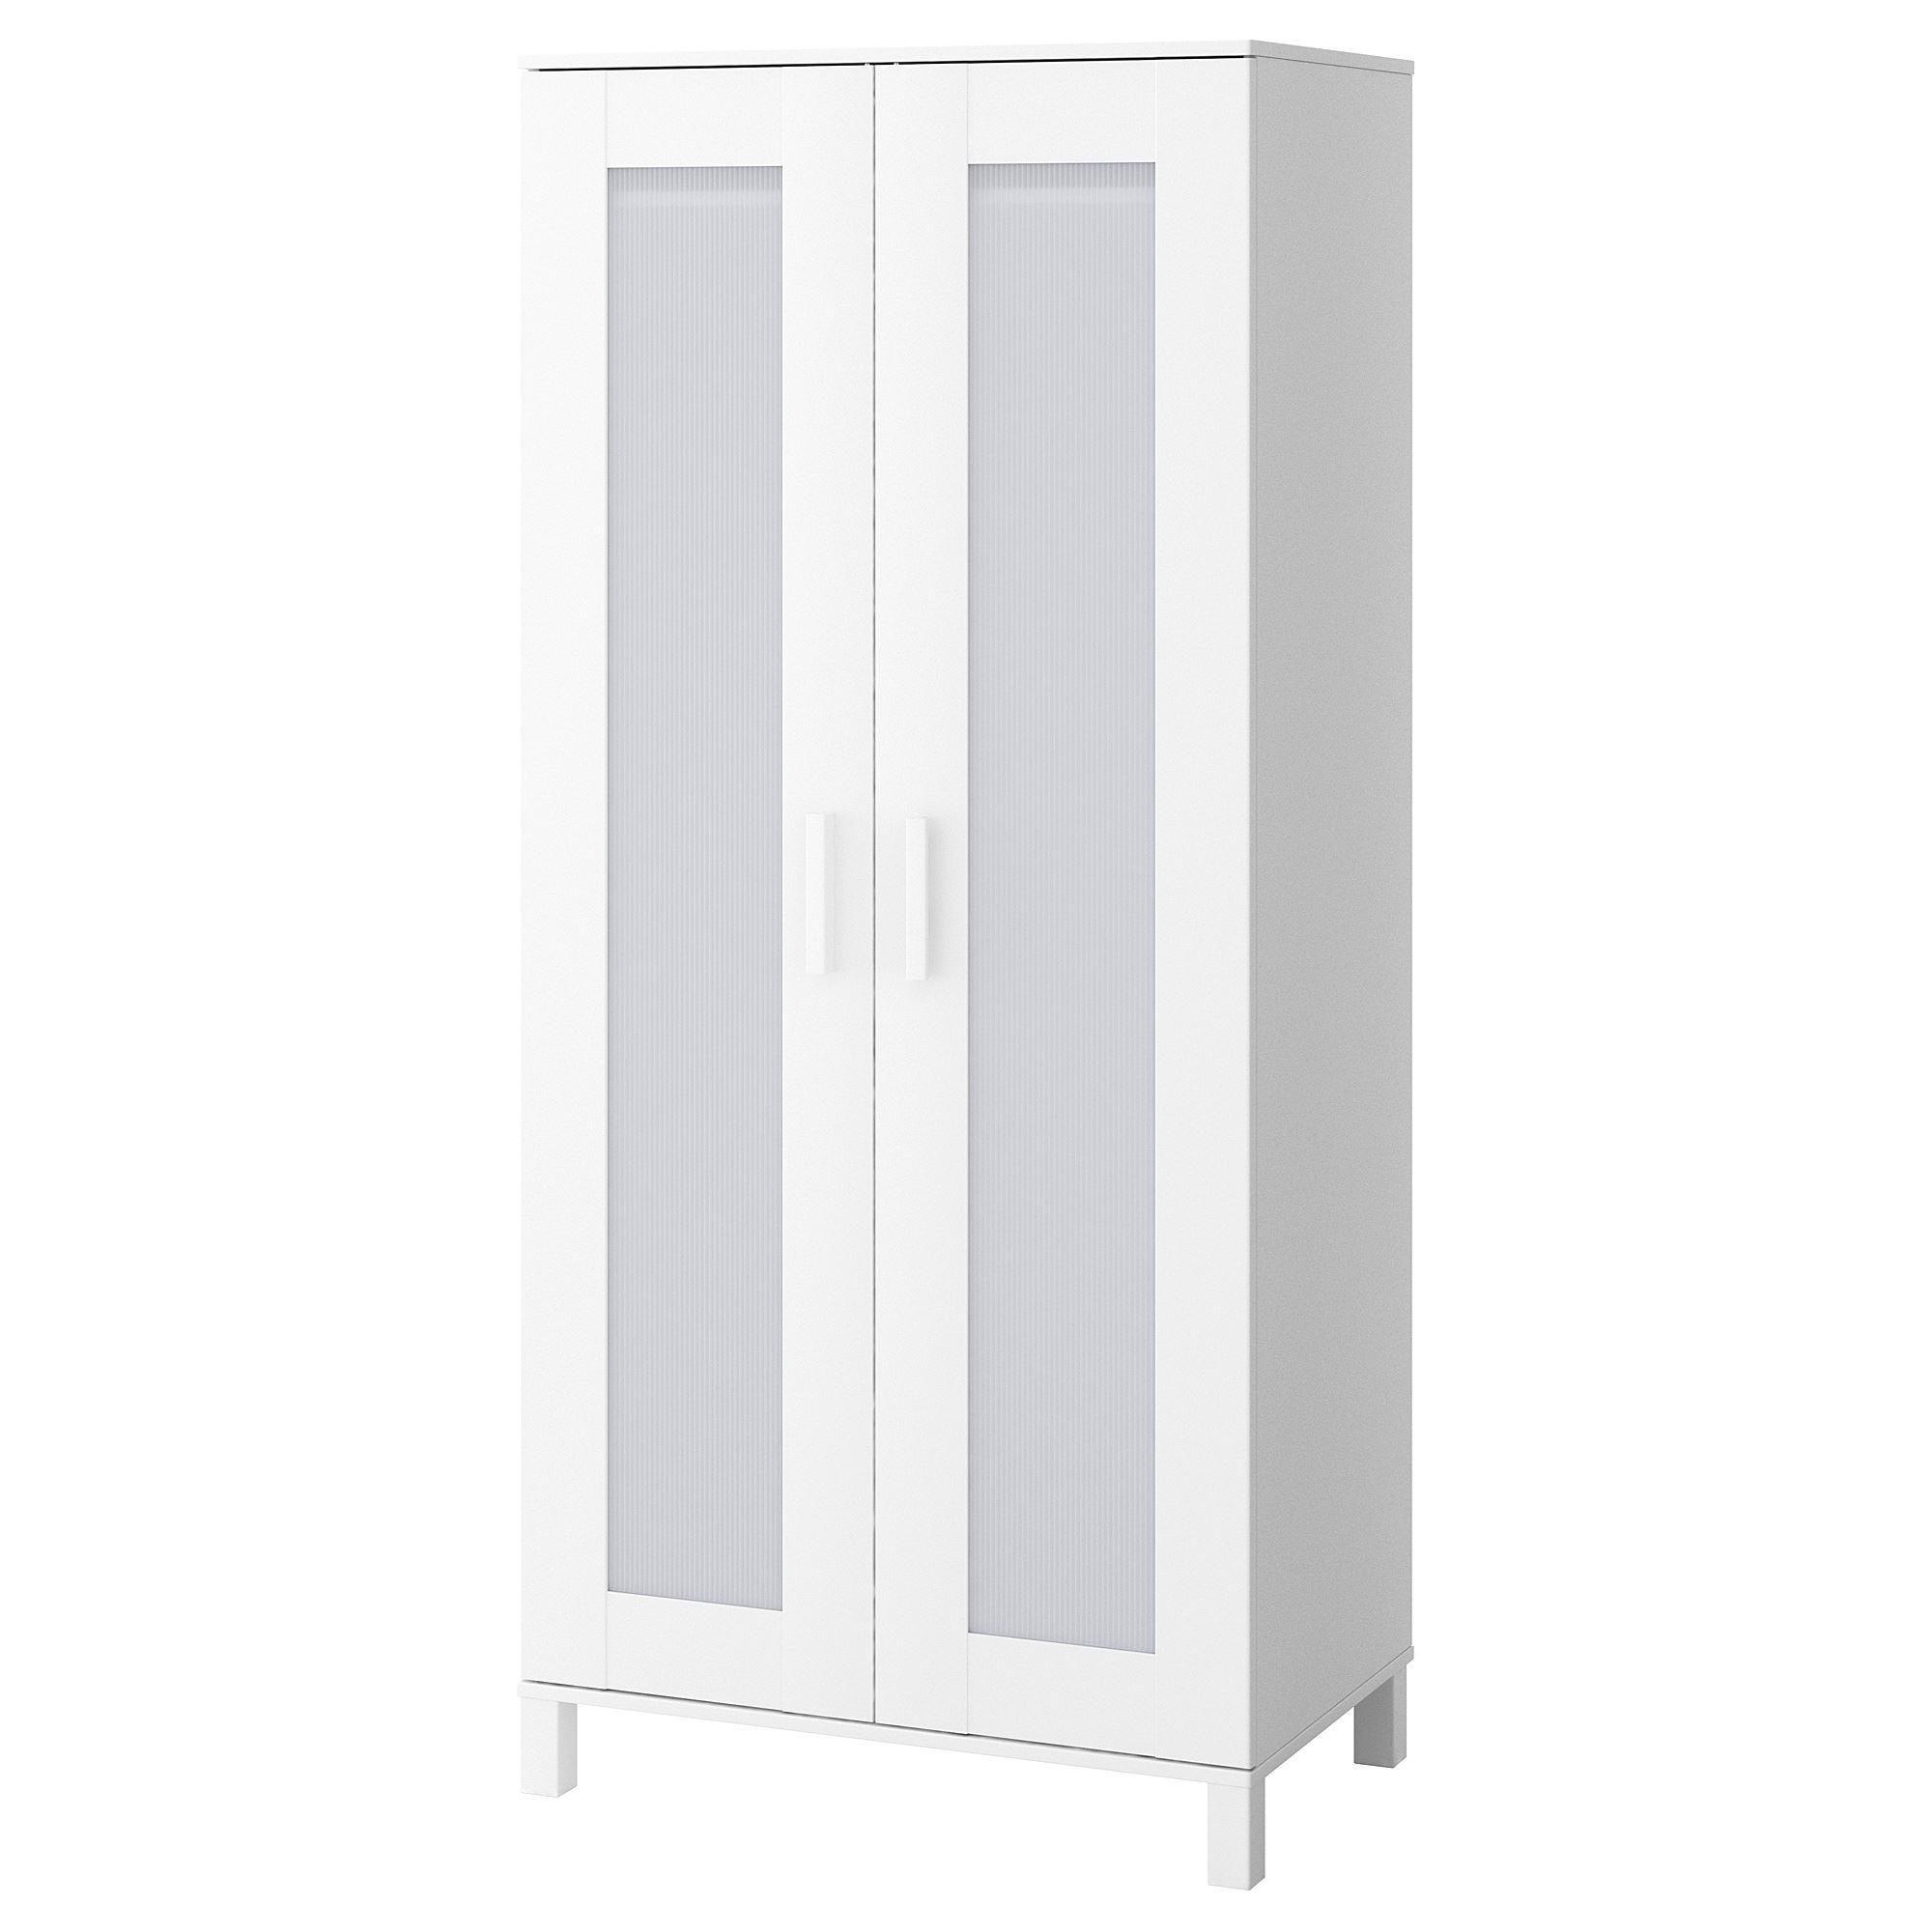 Aneboda Wardrobe White 81x50x180 Cm Ikea Bedroom